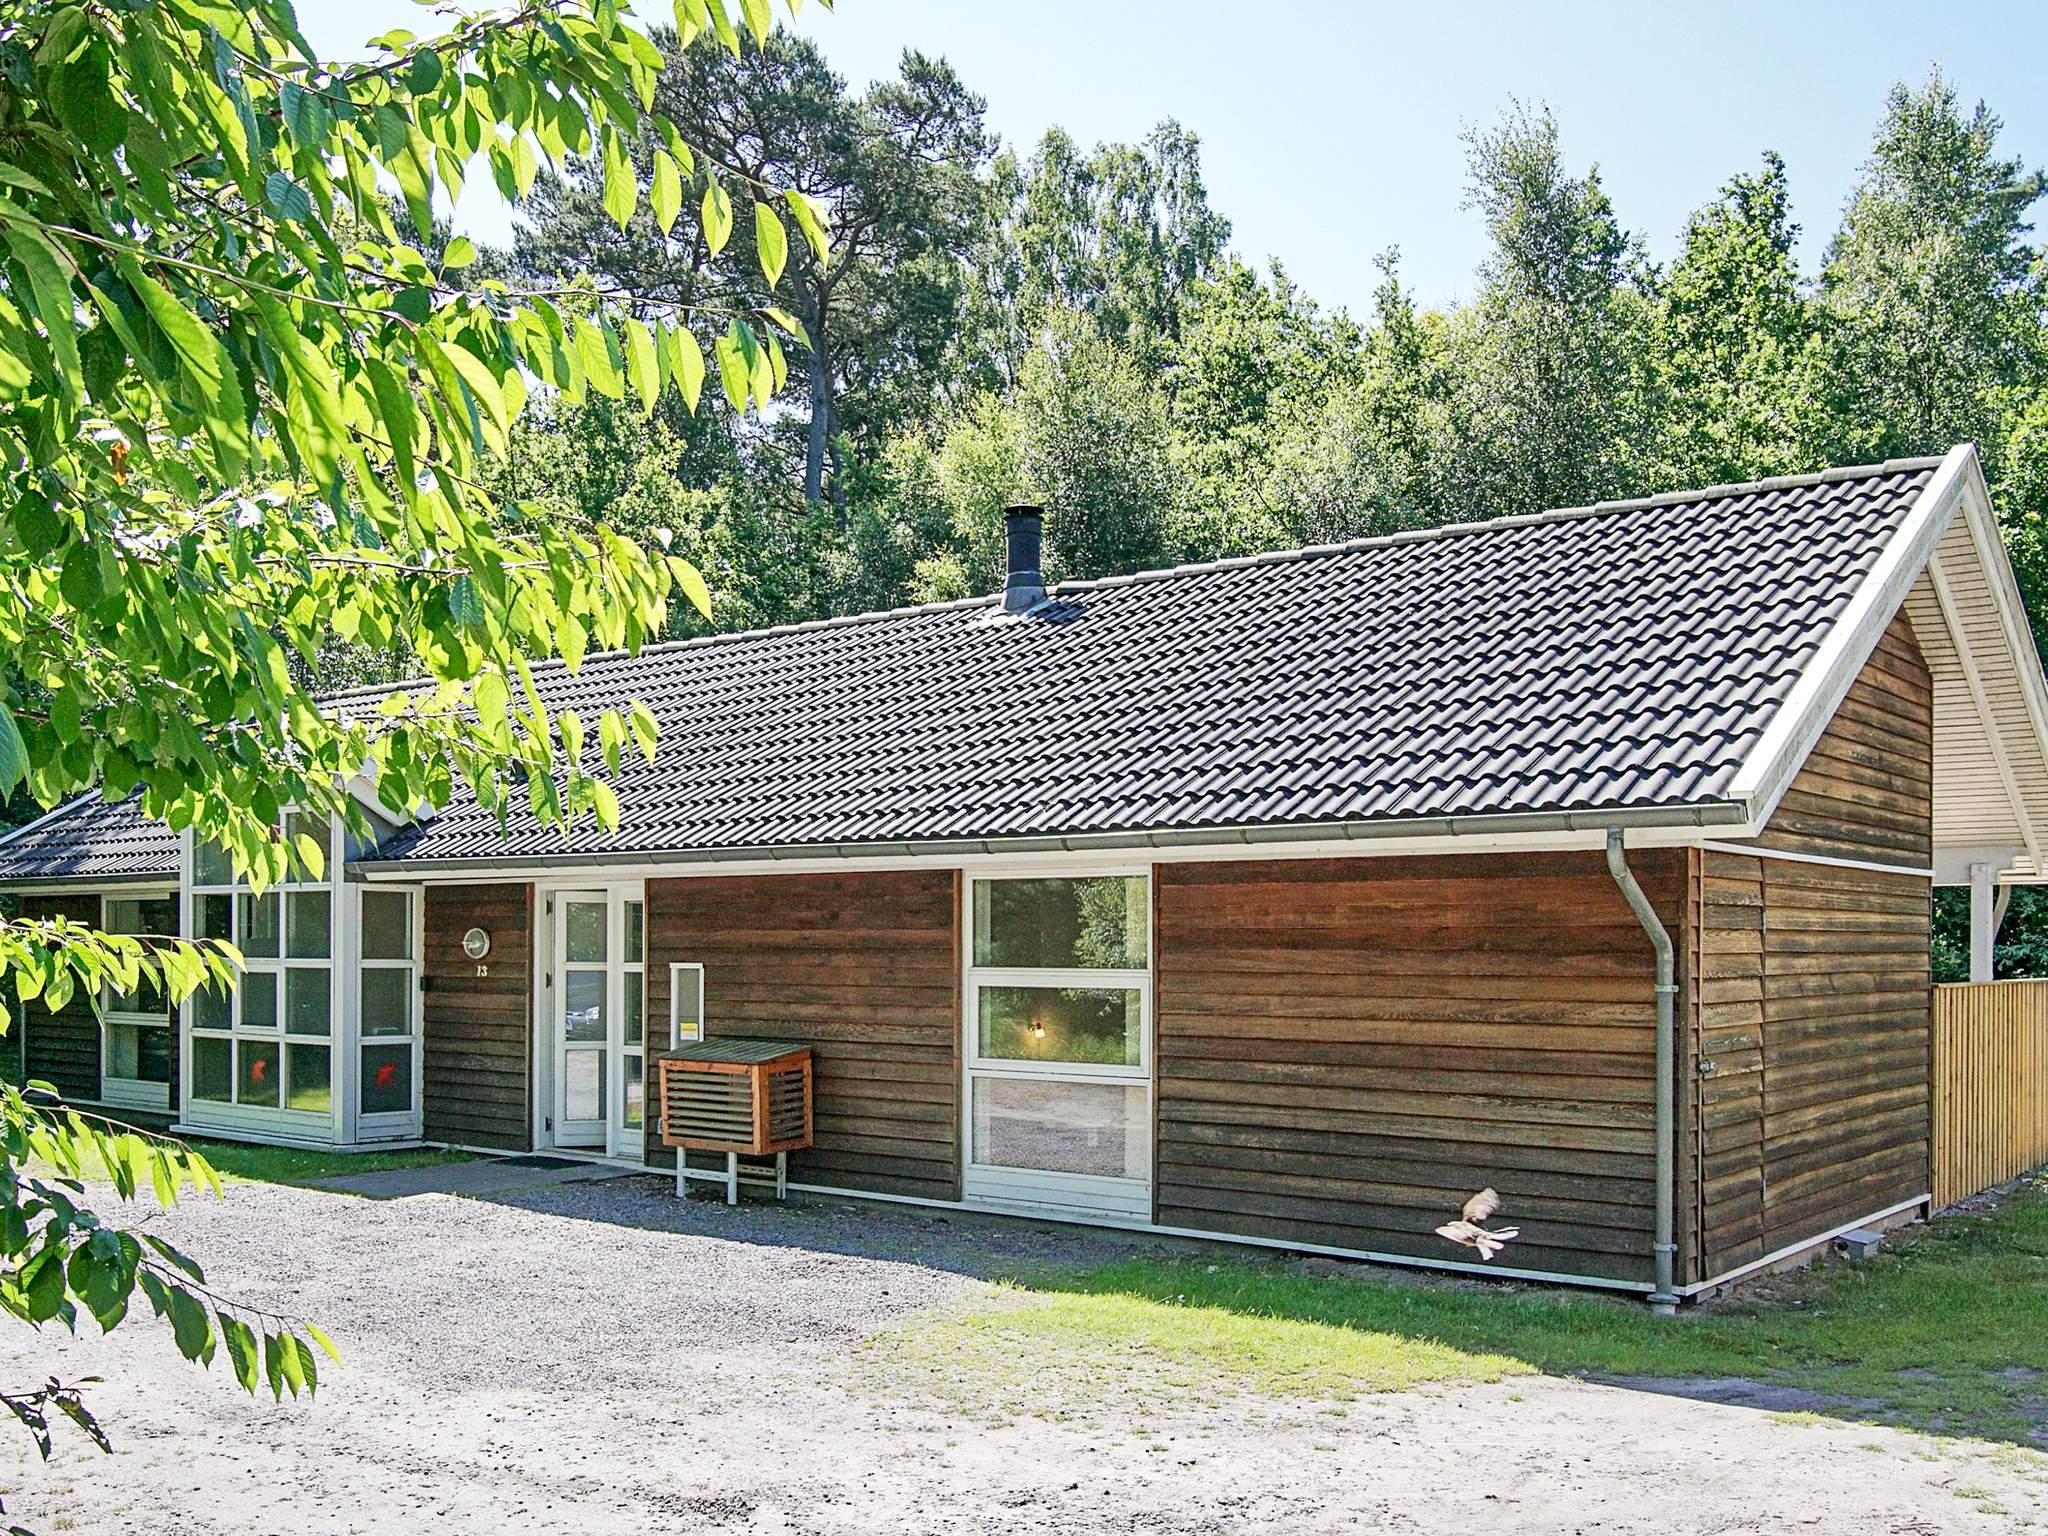 Ferienhaus Hasle (241698), Hasle, , Bornholm, Dänemark, Bild 17